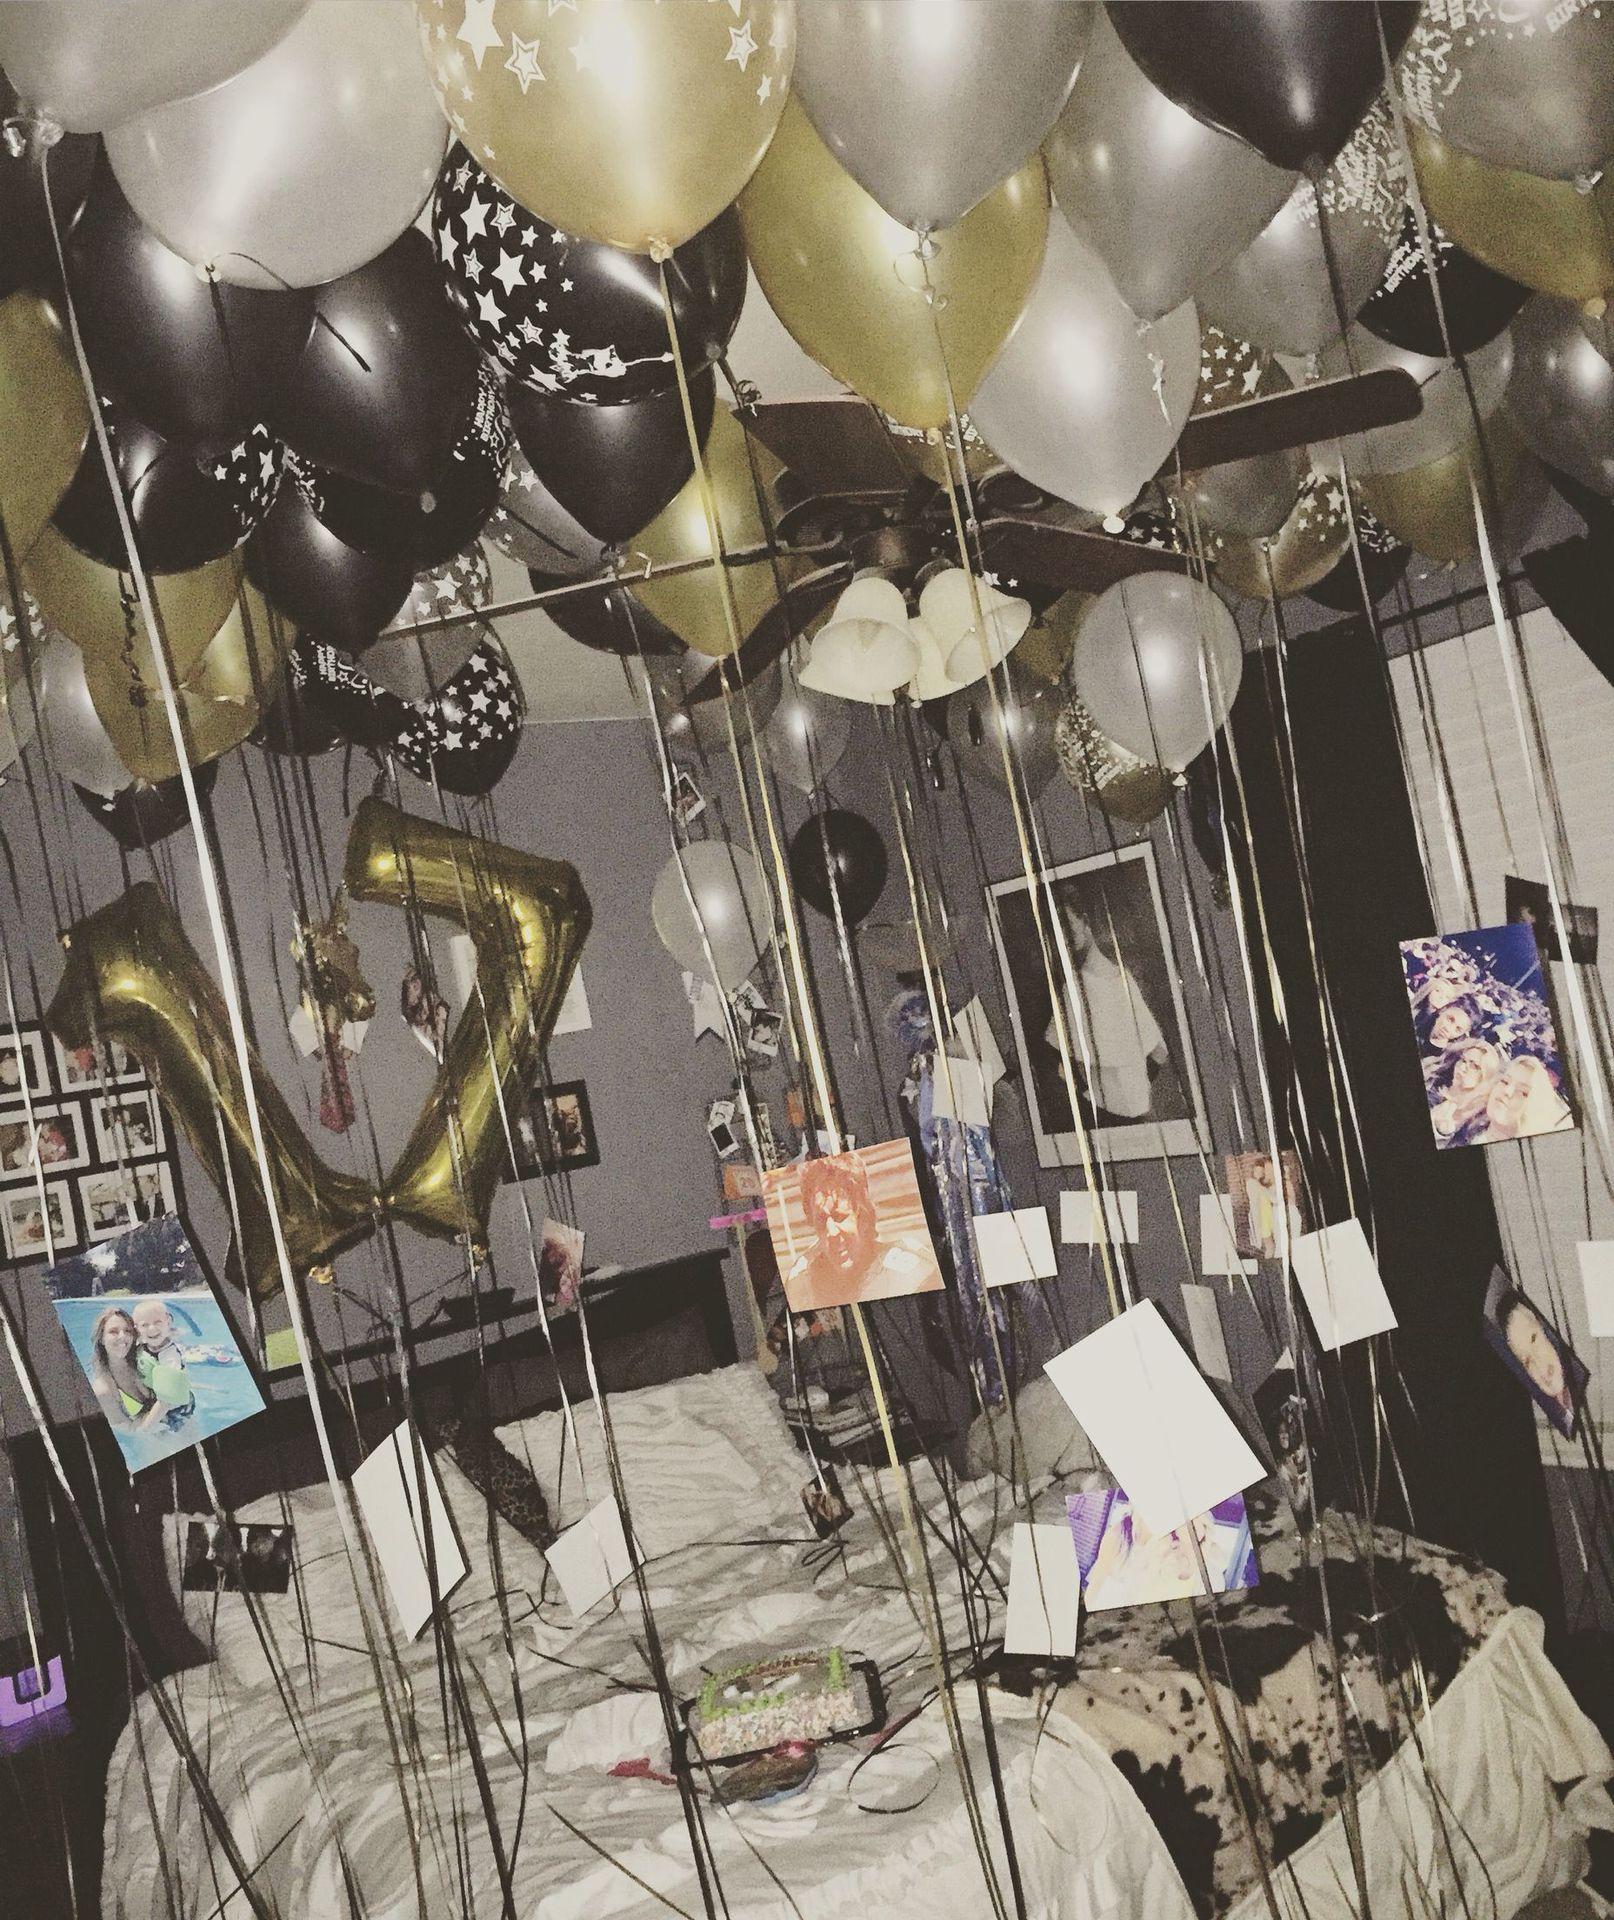 Enemy Or Lover Happy 17th Birthday 17th Birthday Party Ideas Birthday Presents For Girls